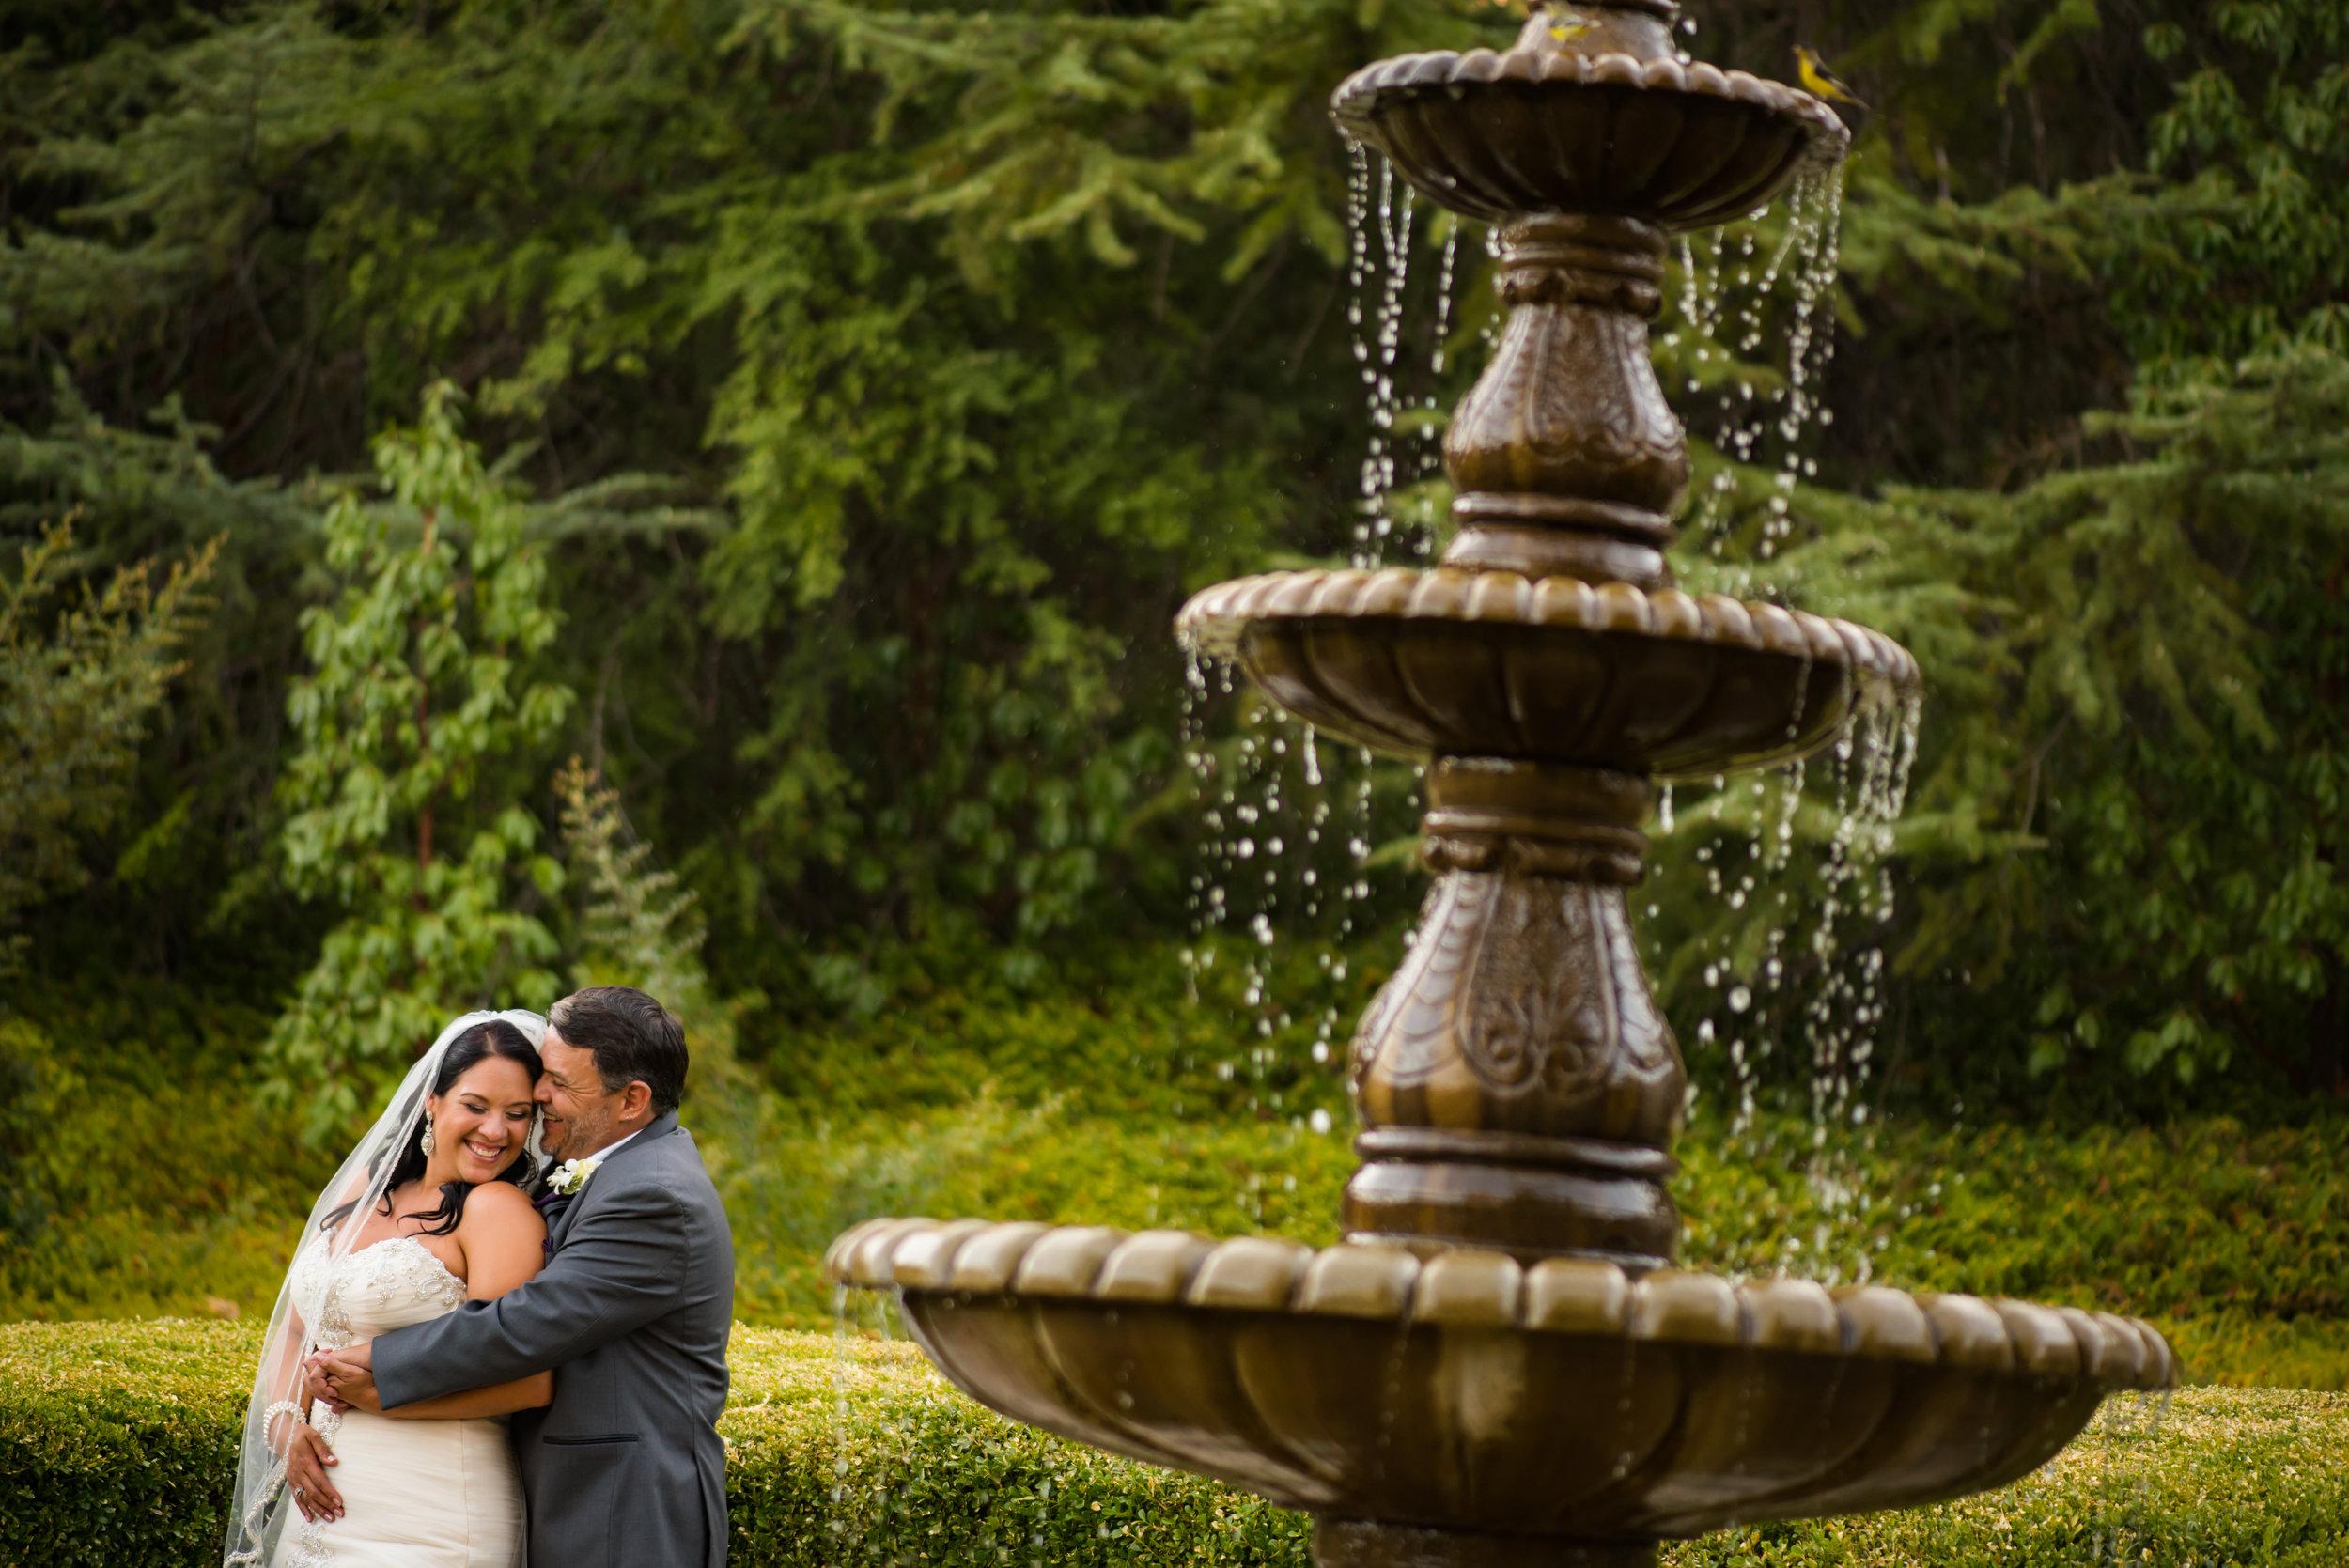 erika-seth-028-monte-verde-inn-sacramento-wedding-photographer-katherine-nicole-photography.JPG